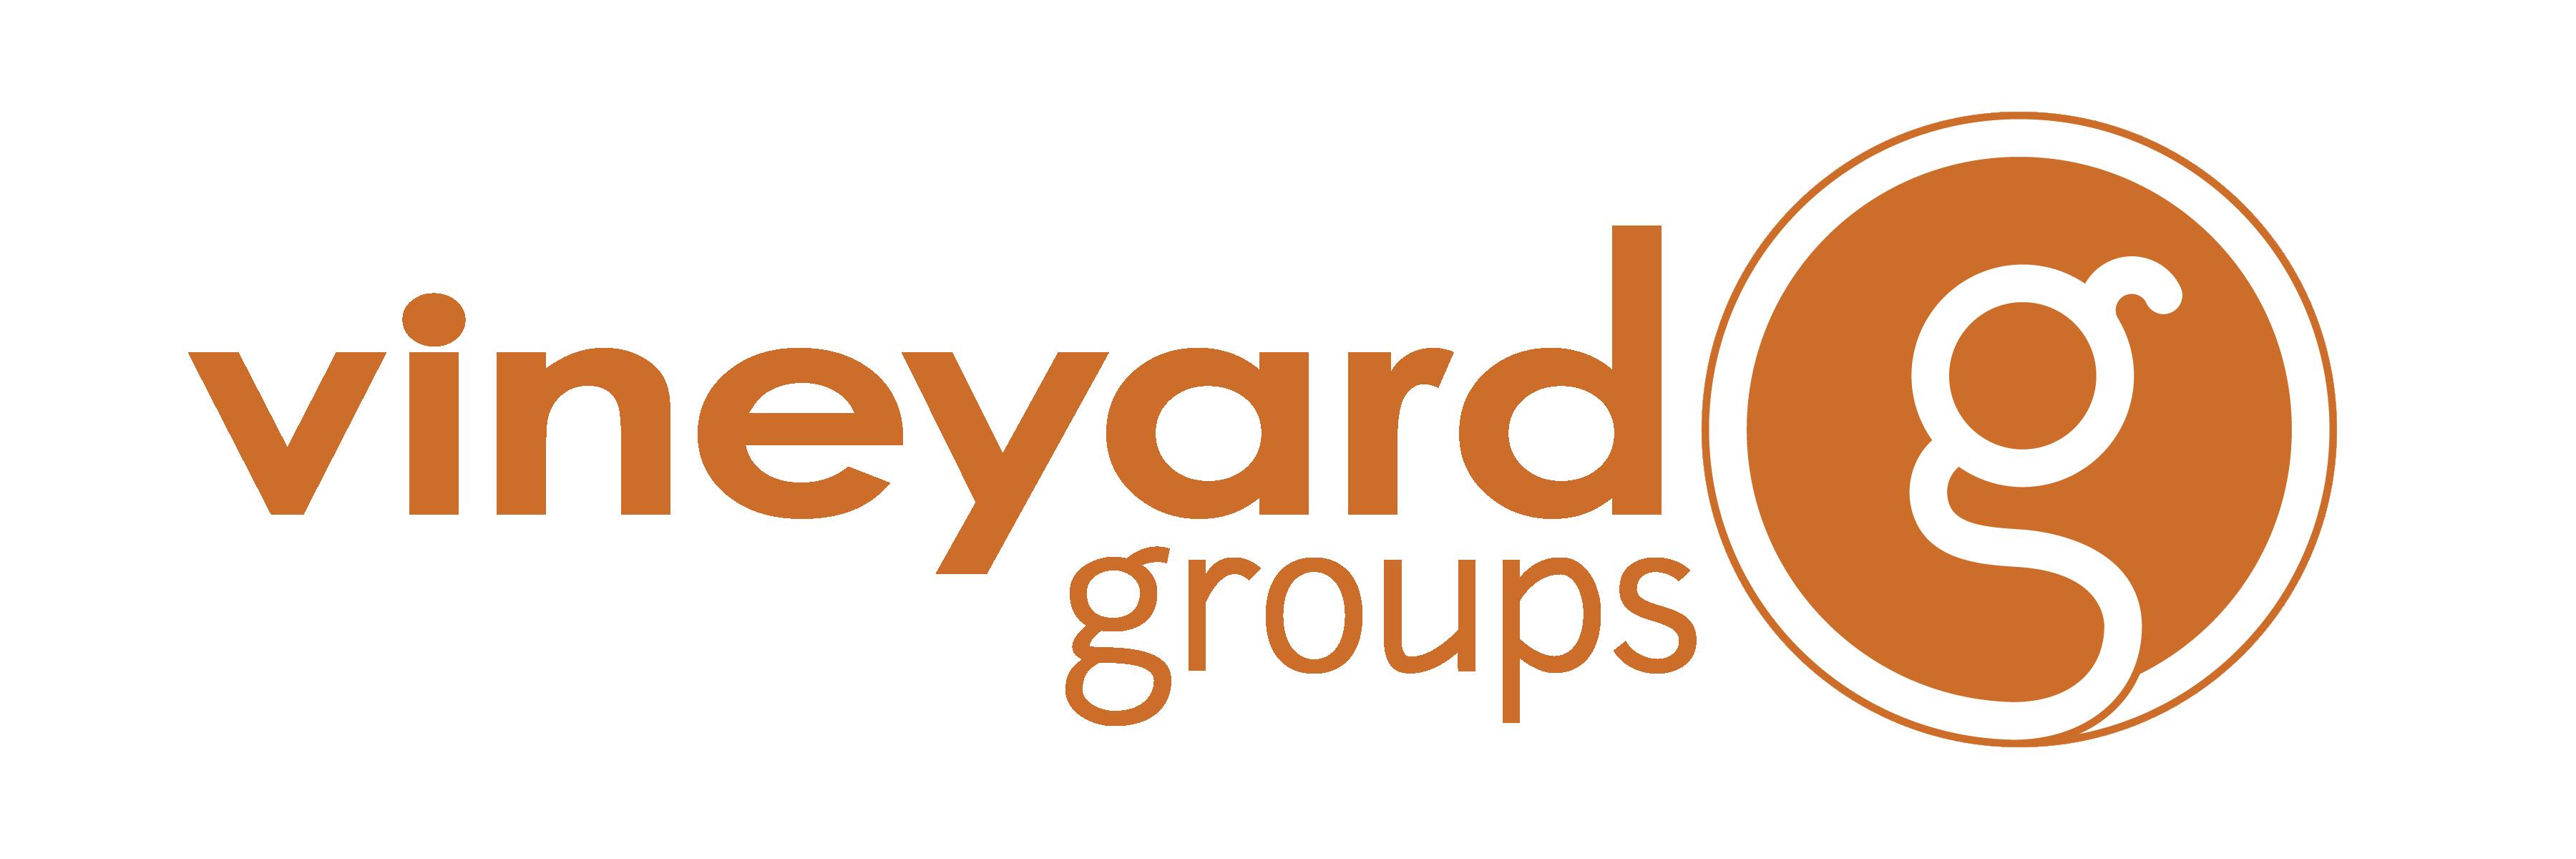 Vineyard Groups